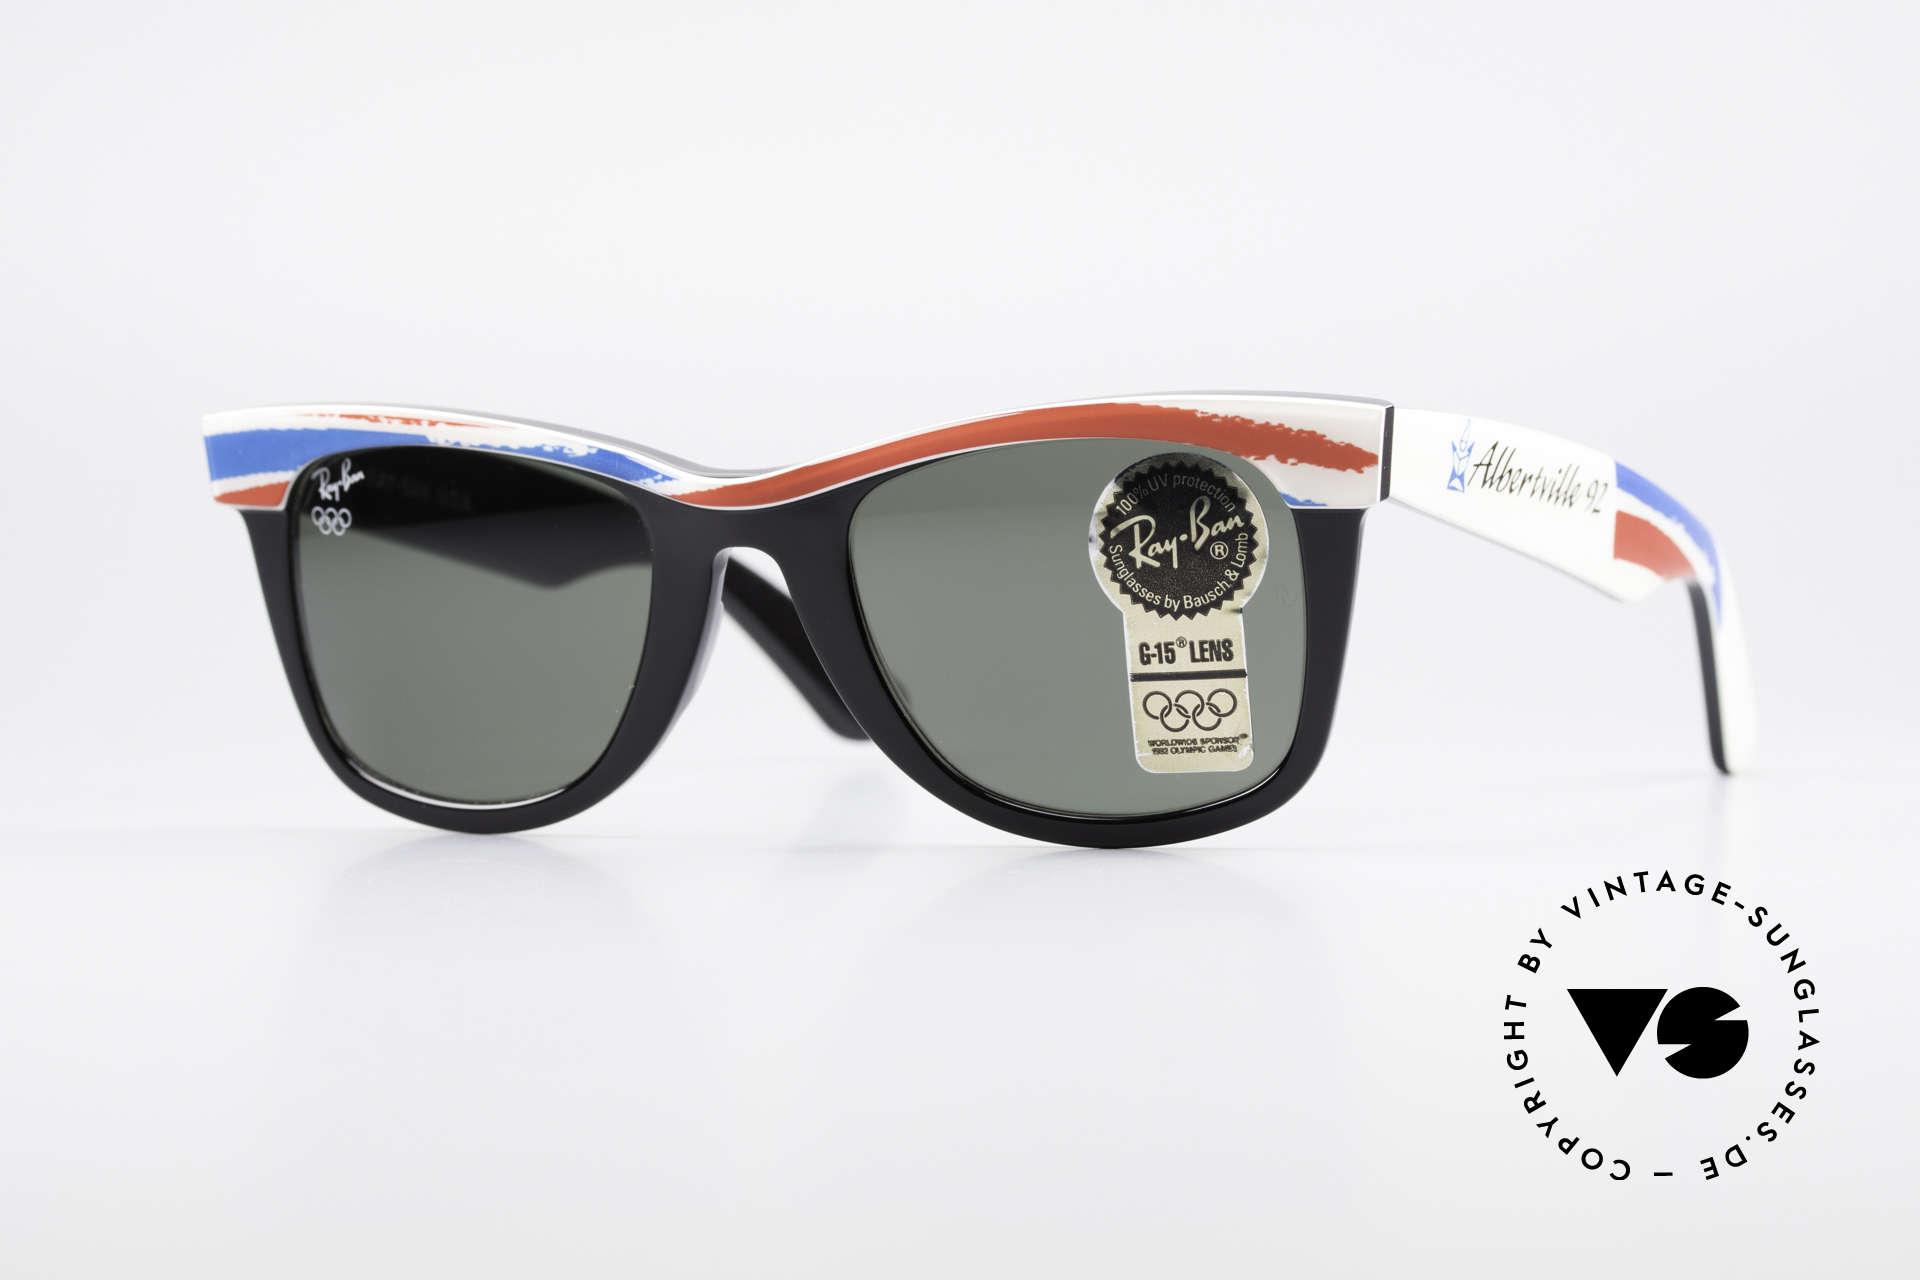 Ray Ban Wayfarer I Olympic Games Albertville, LIMITED Bausch&Lomb vintage Wayfarer sunglasses, Made for Men and Women